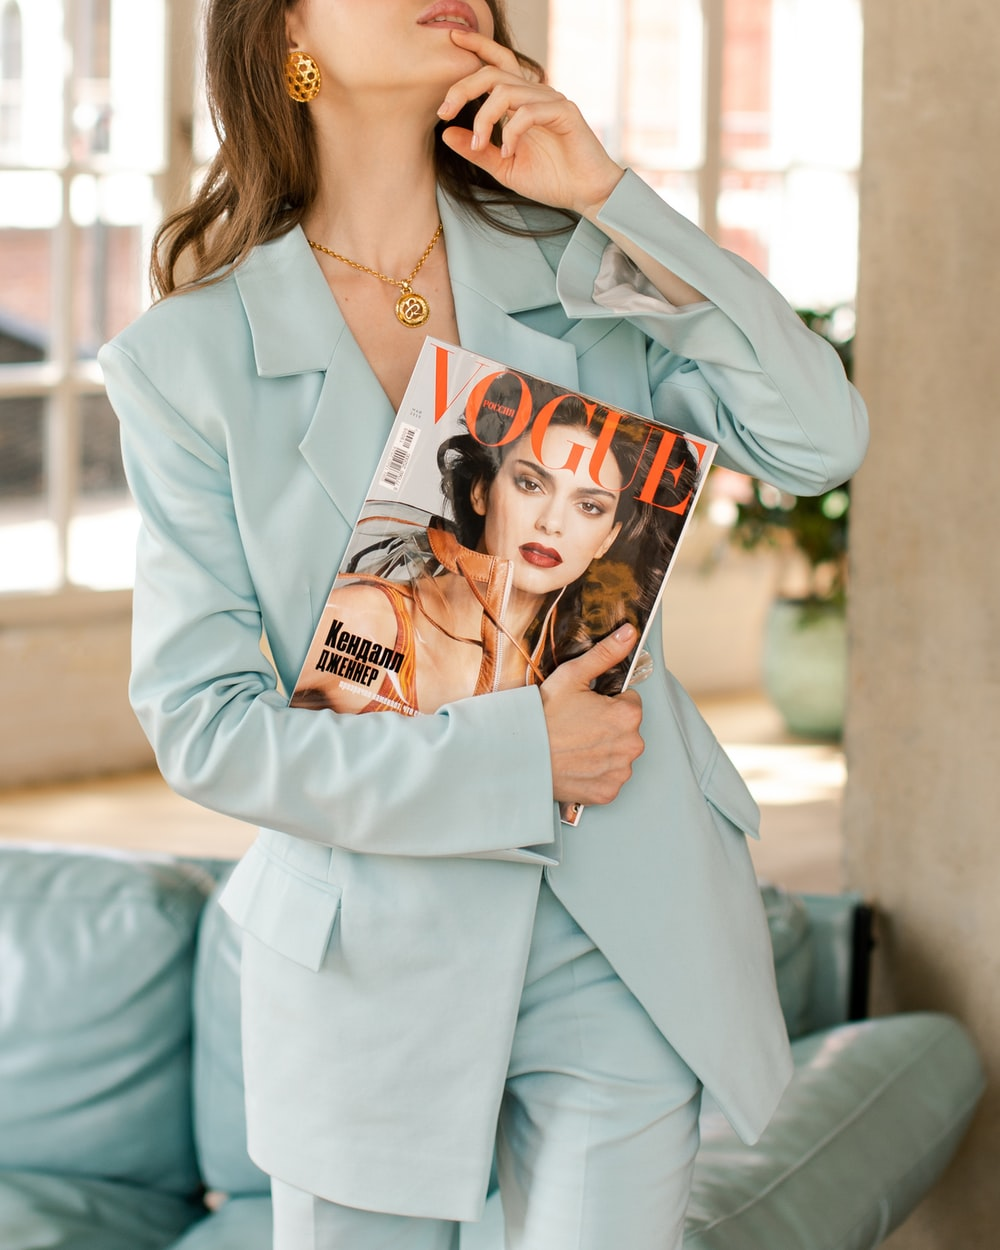 woman wearing blazer holding Vogue magazine